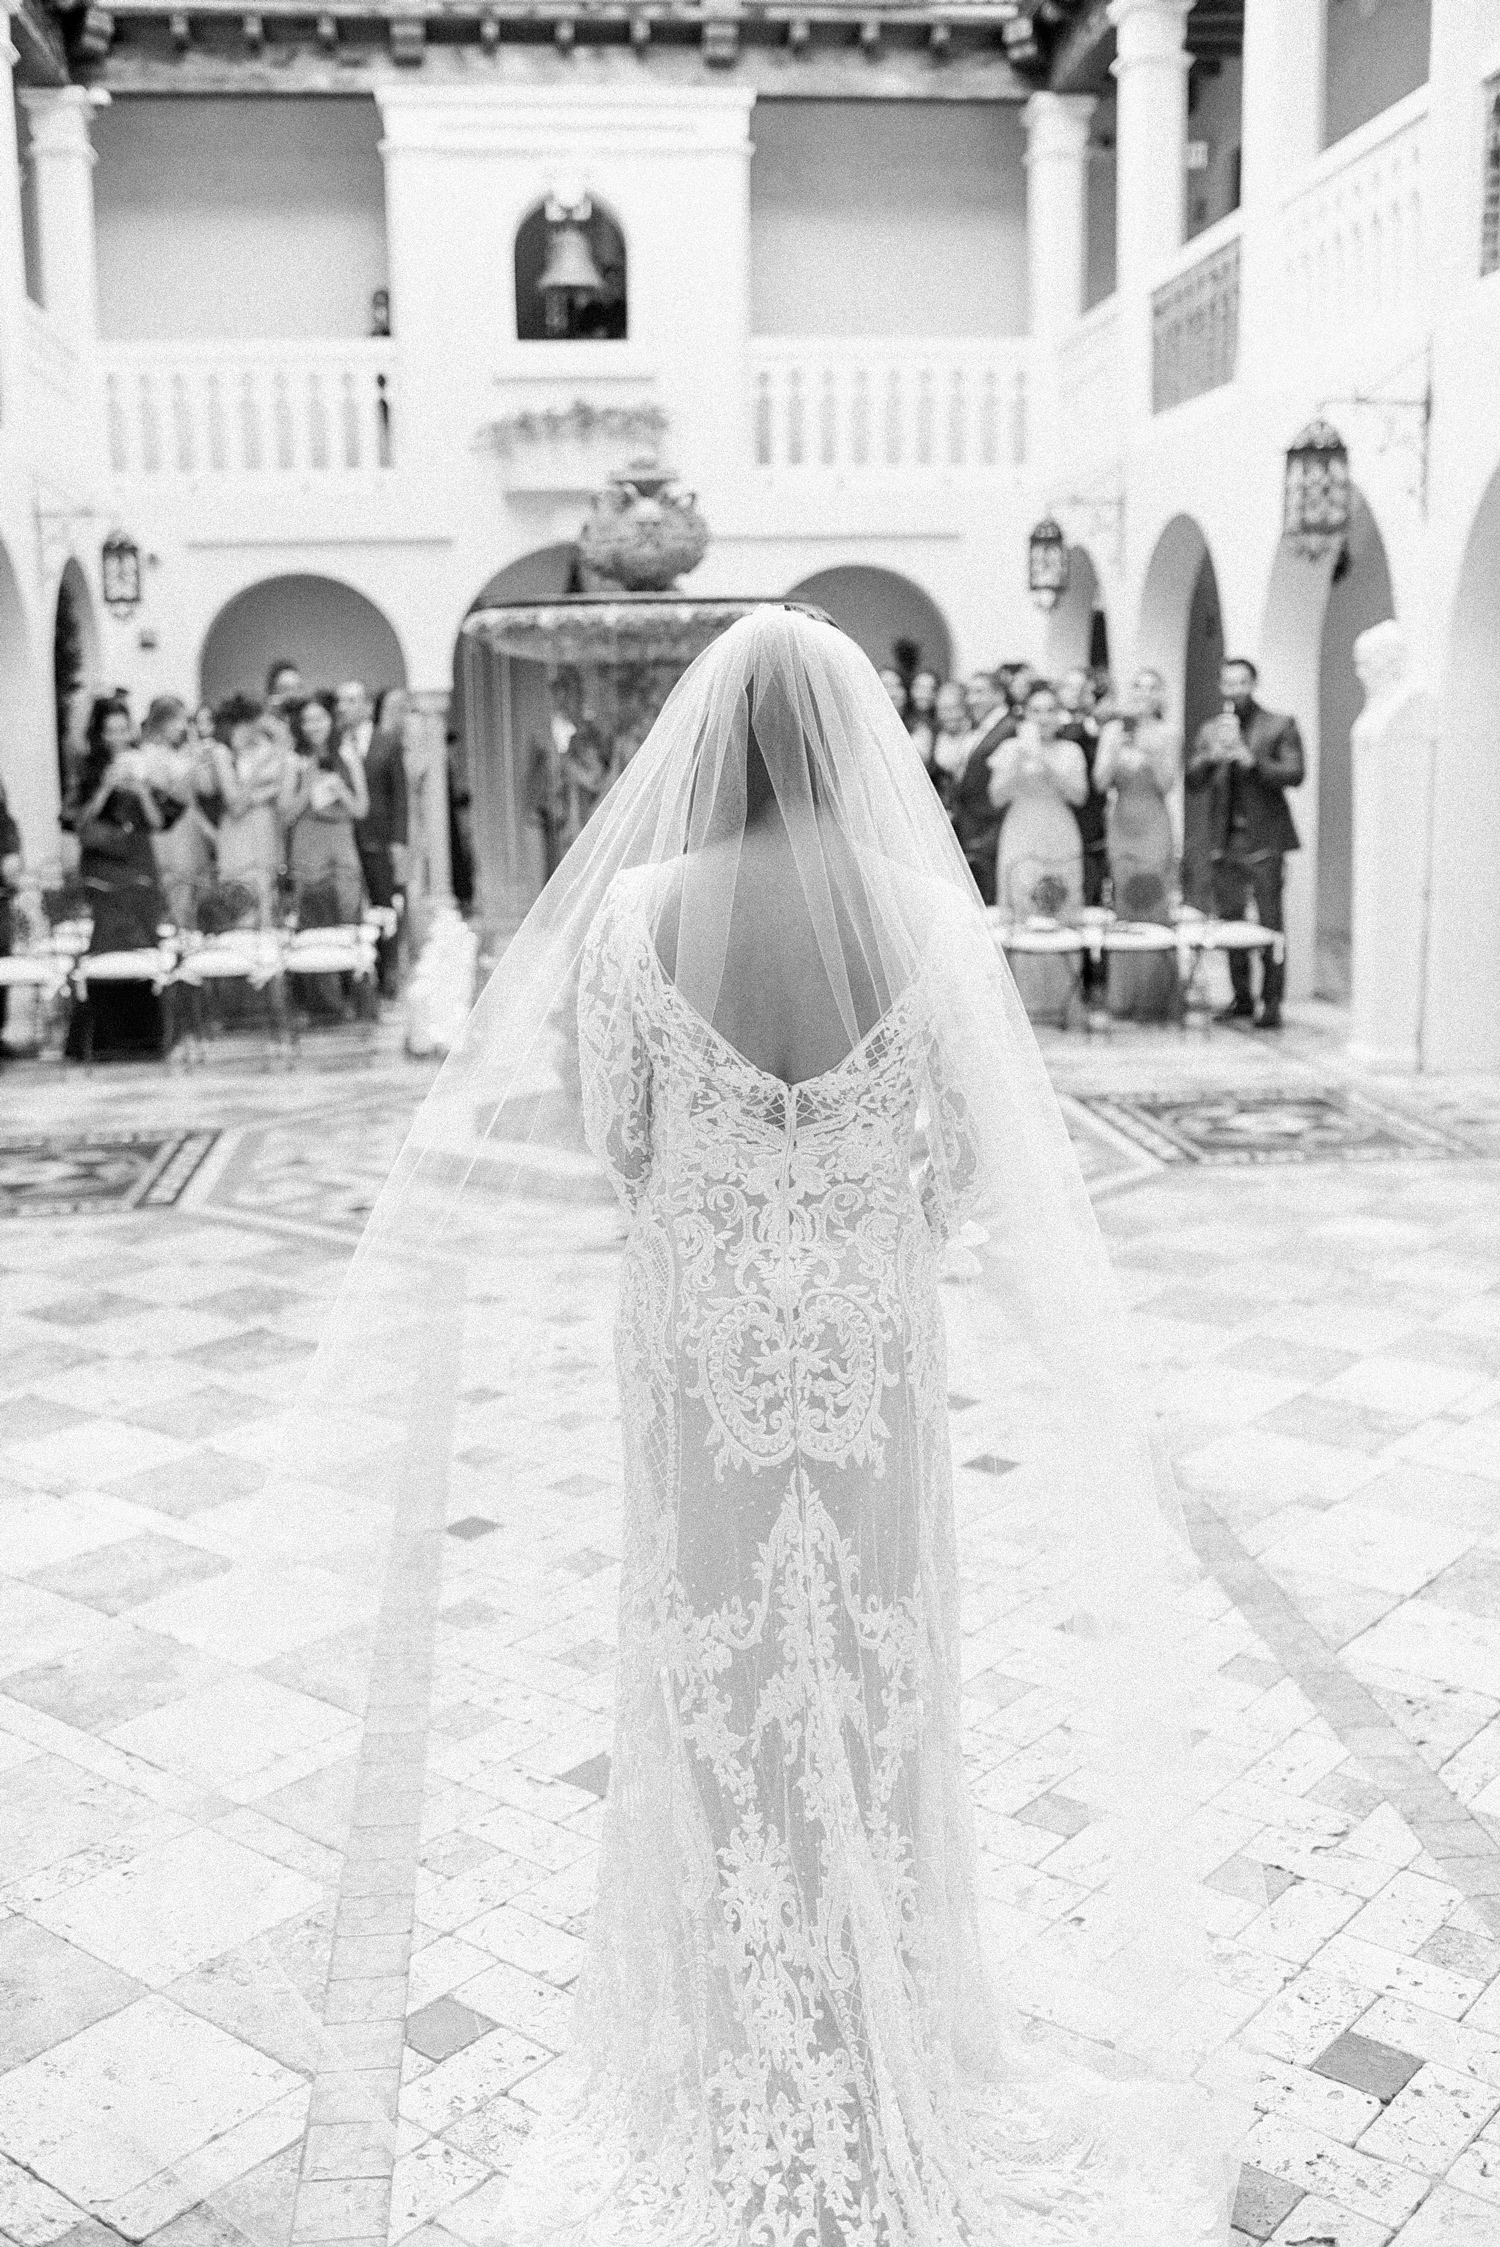 bride walks down wedding aisle unescorted